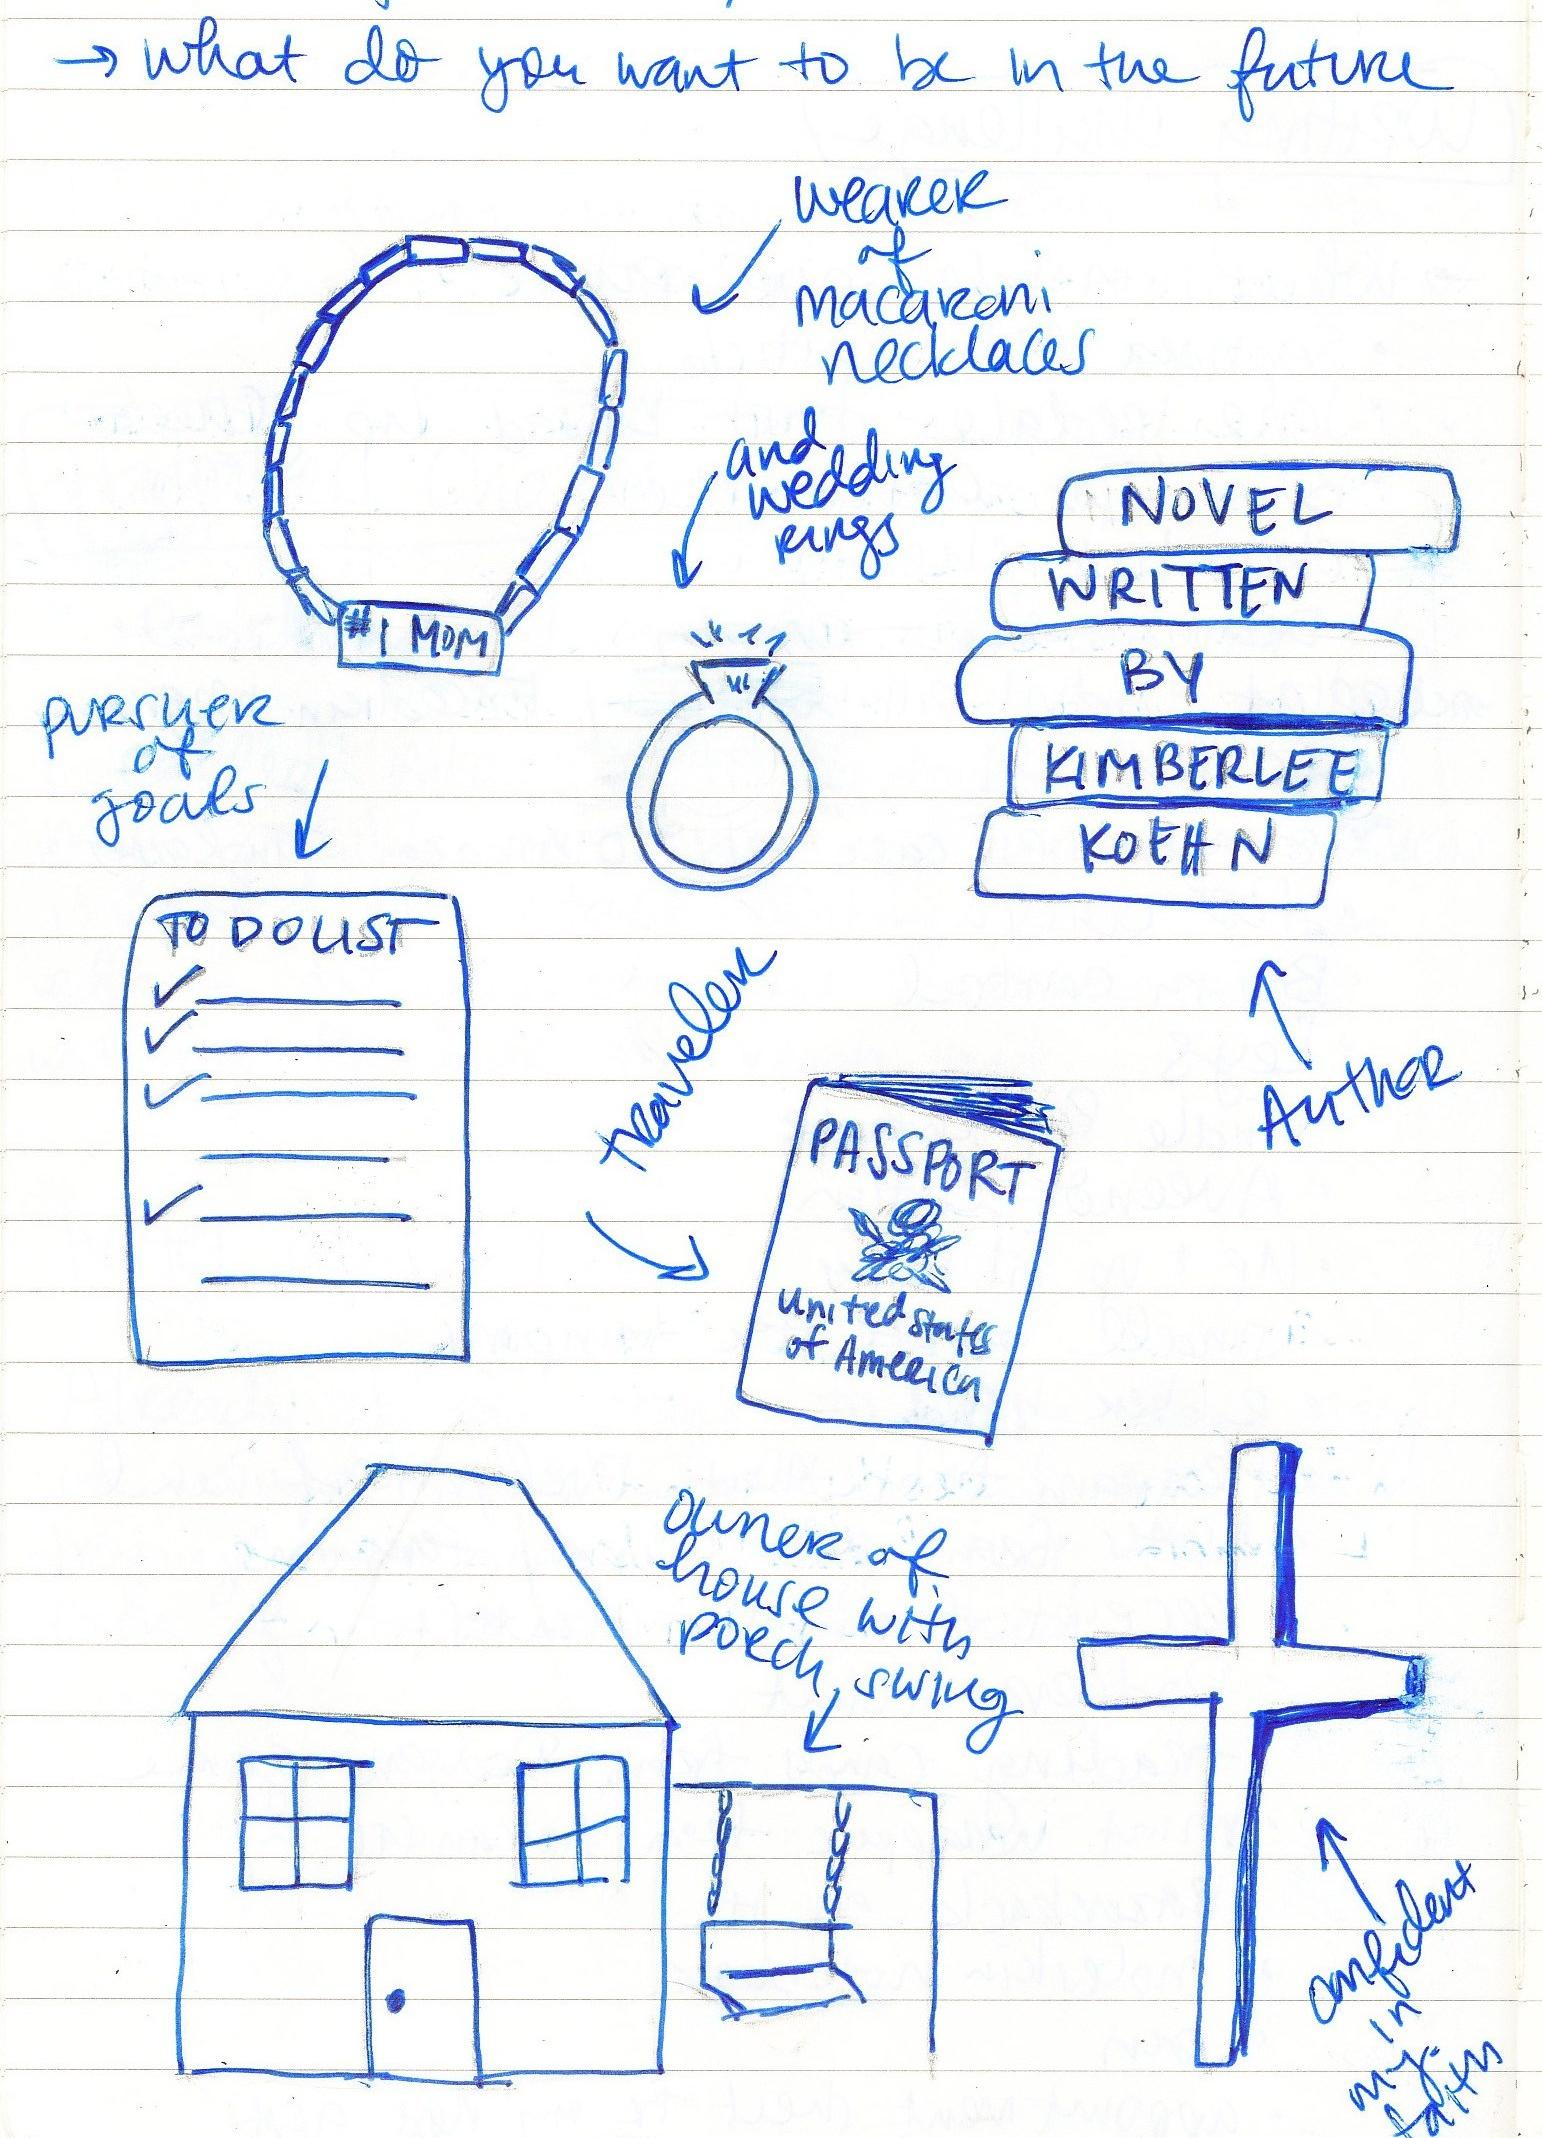 drawing-2-e1536127708377.jpg